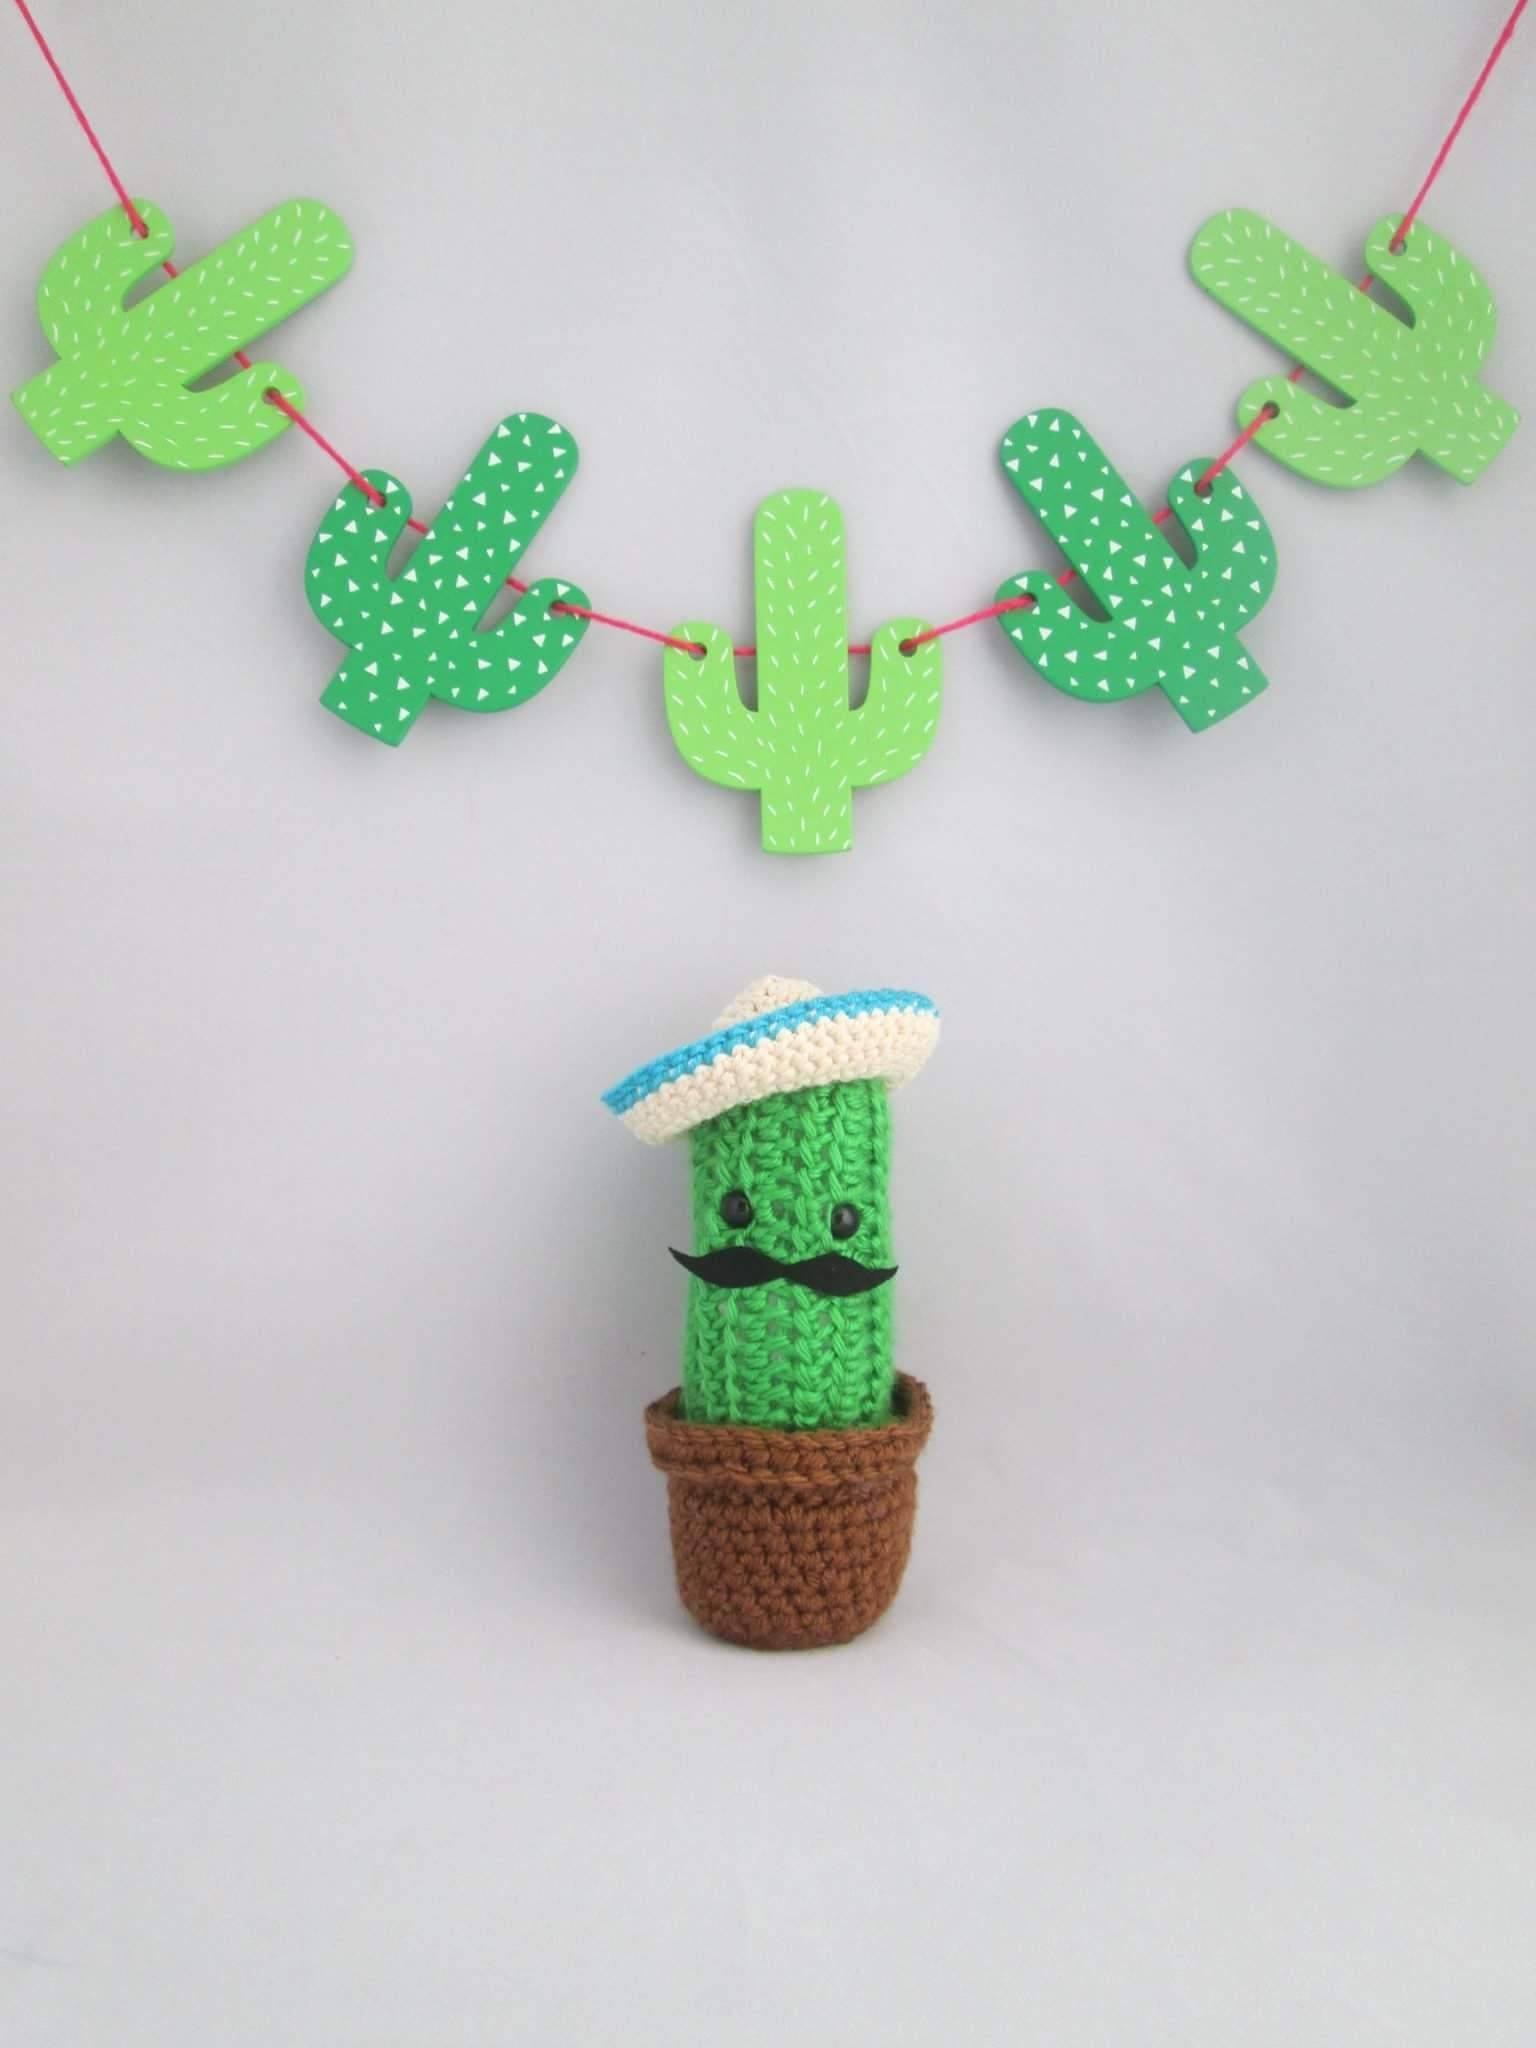 Crochet Cactus Patterns Best Ideas Video Instructions | 2048x1536